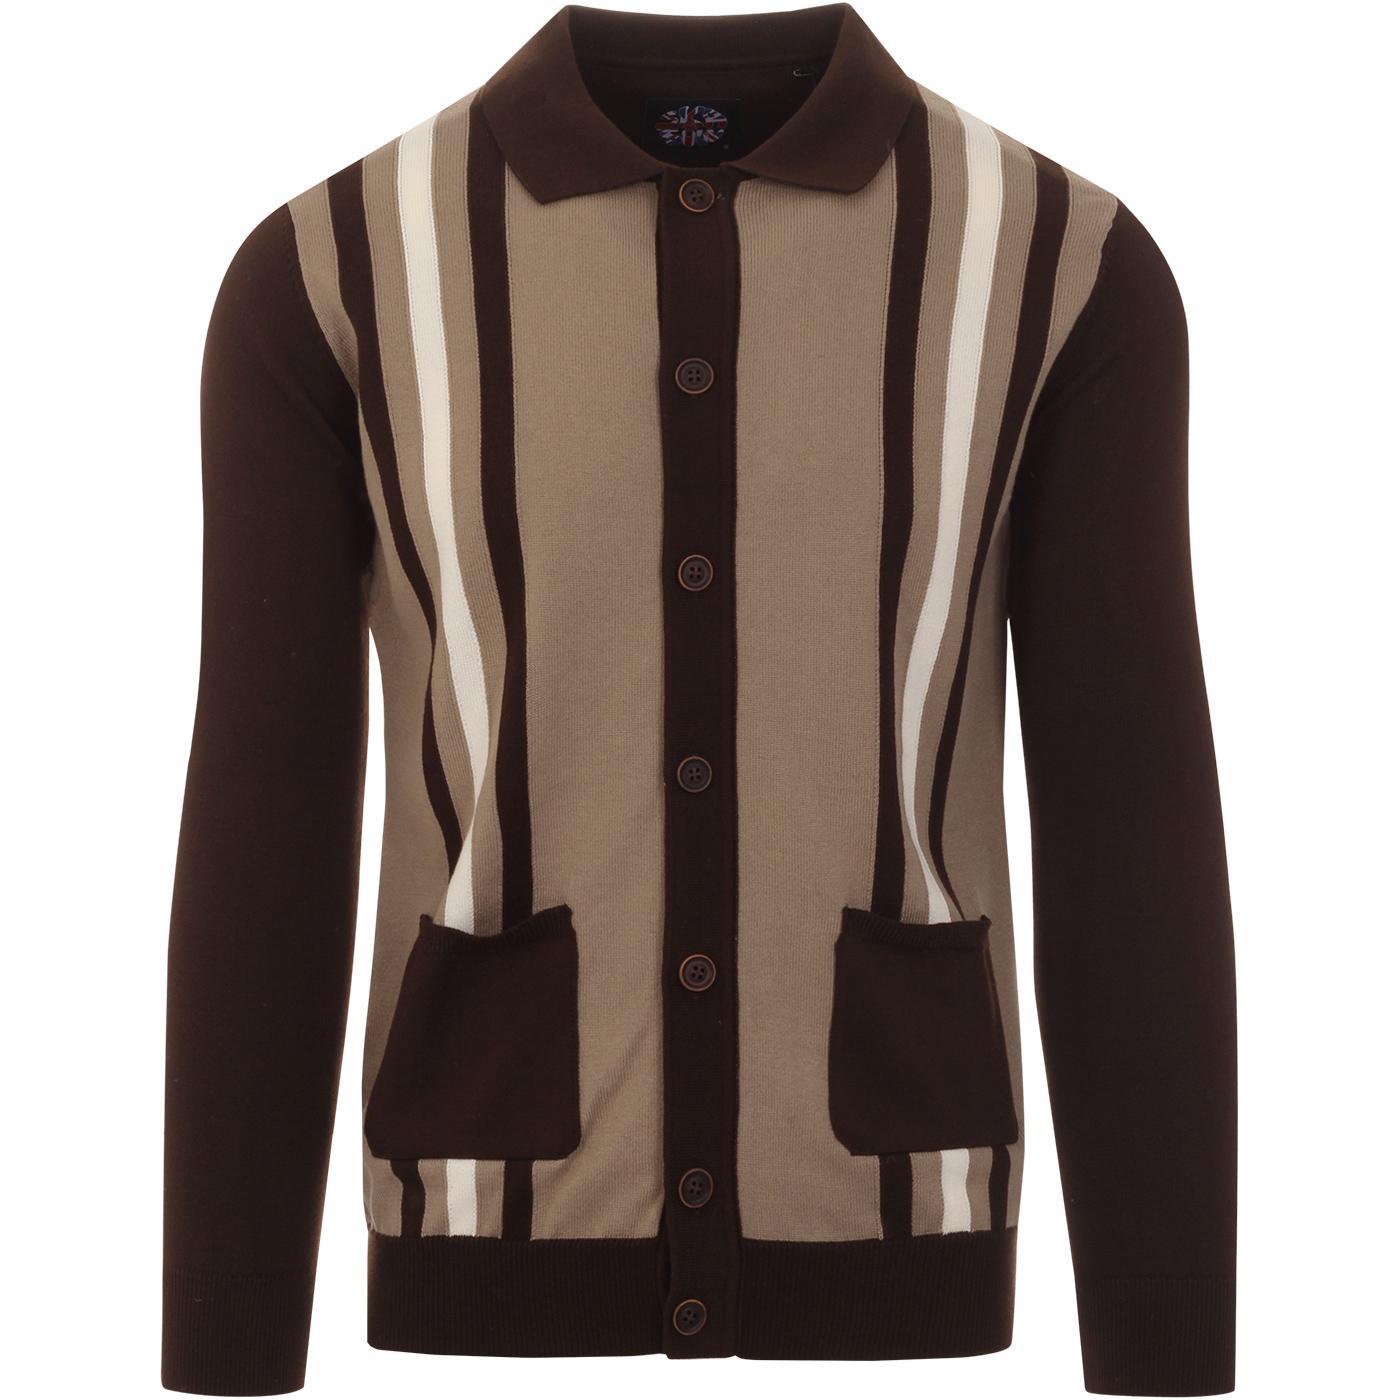 SKA & SOUL Retro Mod Stripe Knit Polo Cardigan (C)